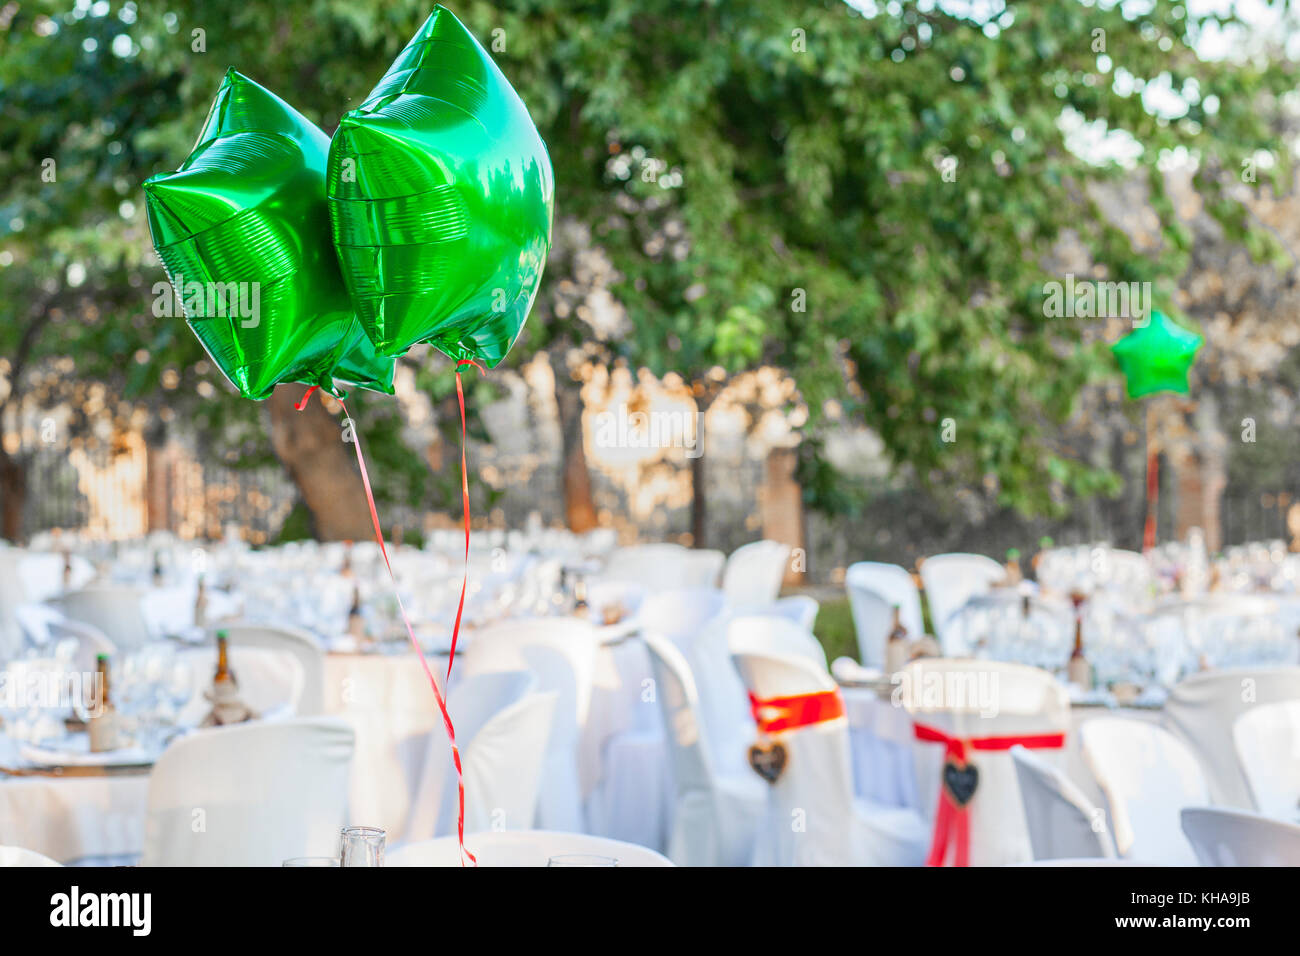 Green Shiny Balloons At Garden Table Setting For Wedding Reception